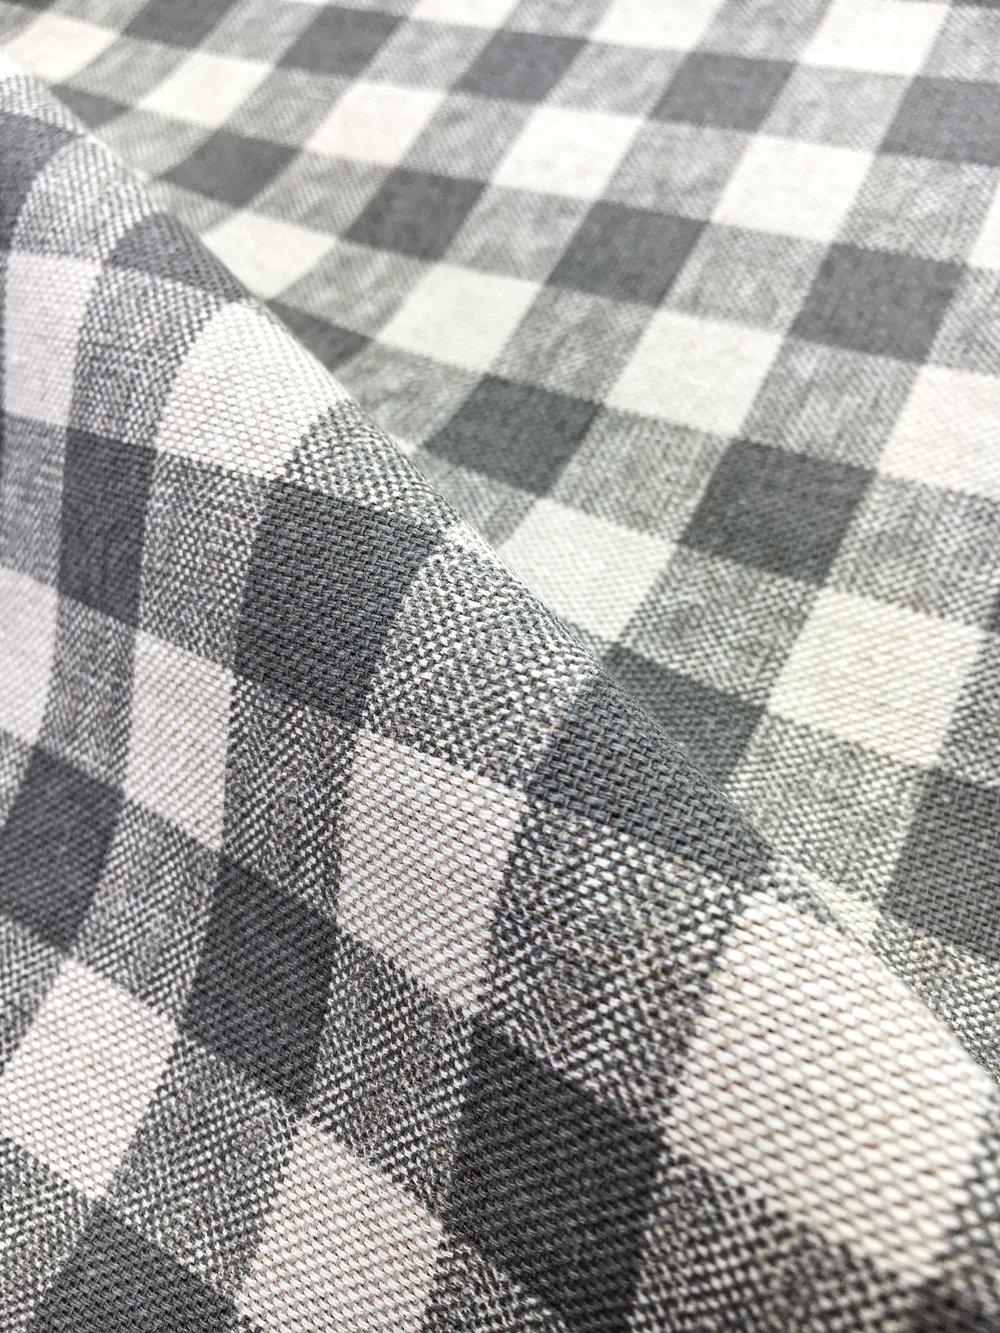 CottonFabricWGCheckers3.jpg